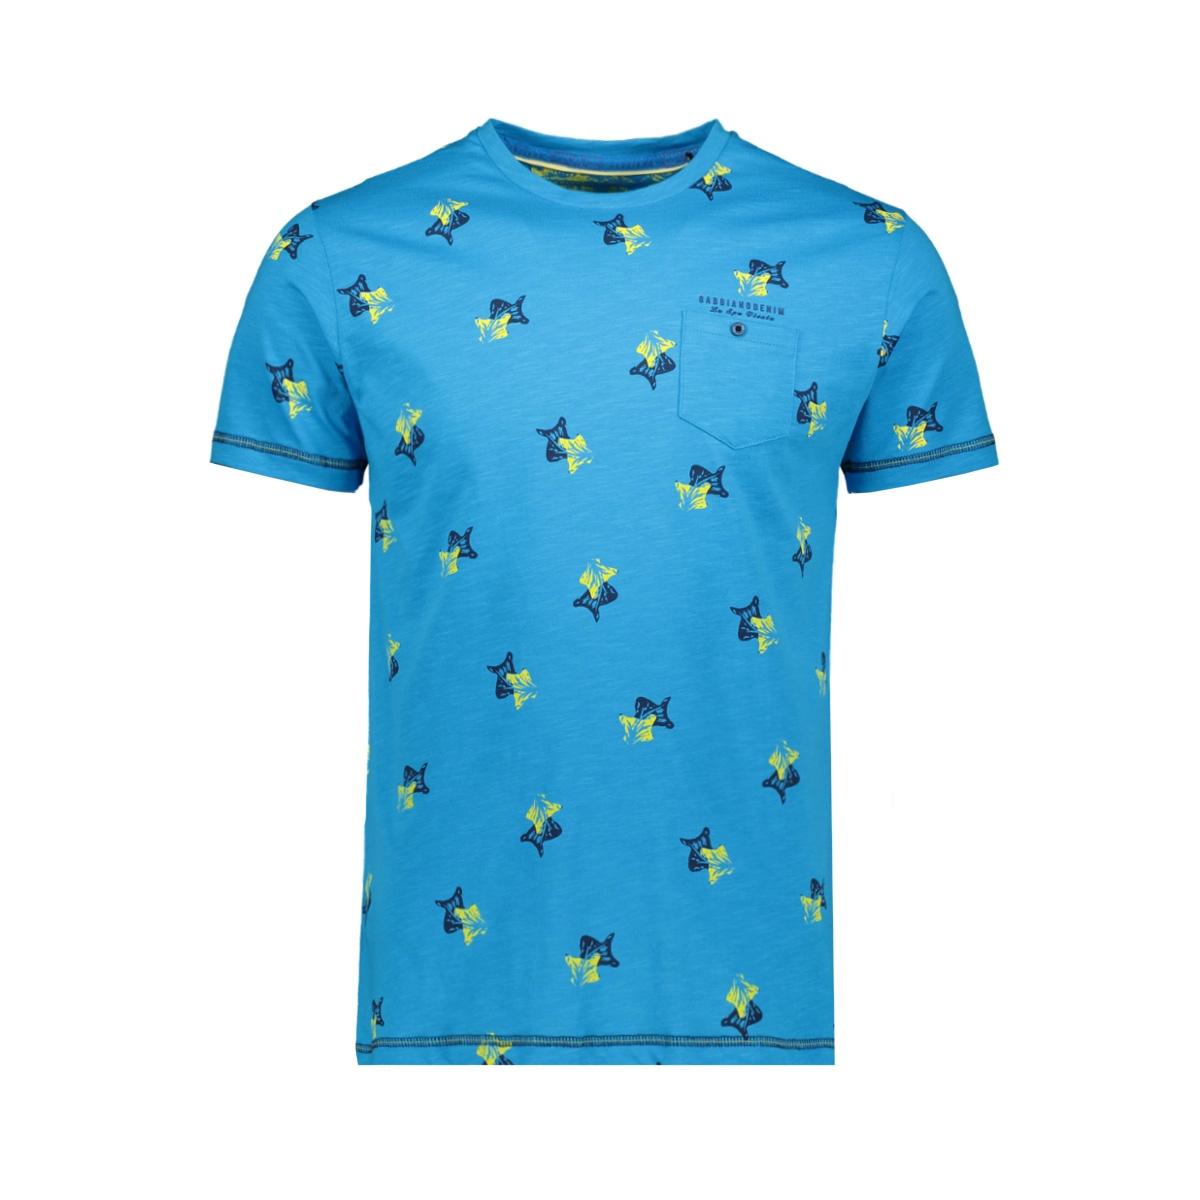 t shirt 15190 gabbiano t-shirt turquoise